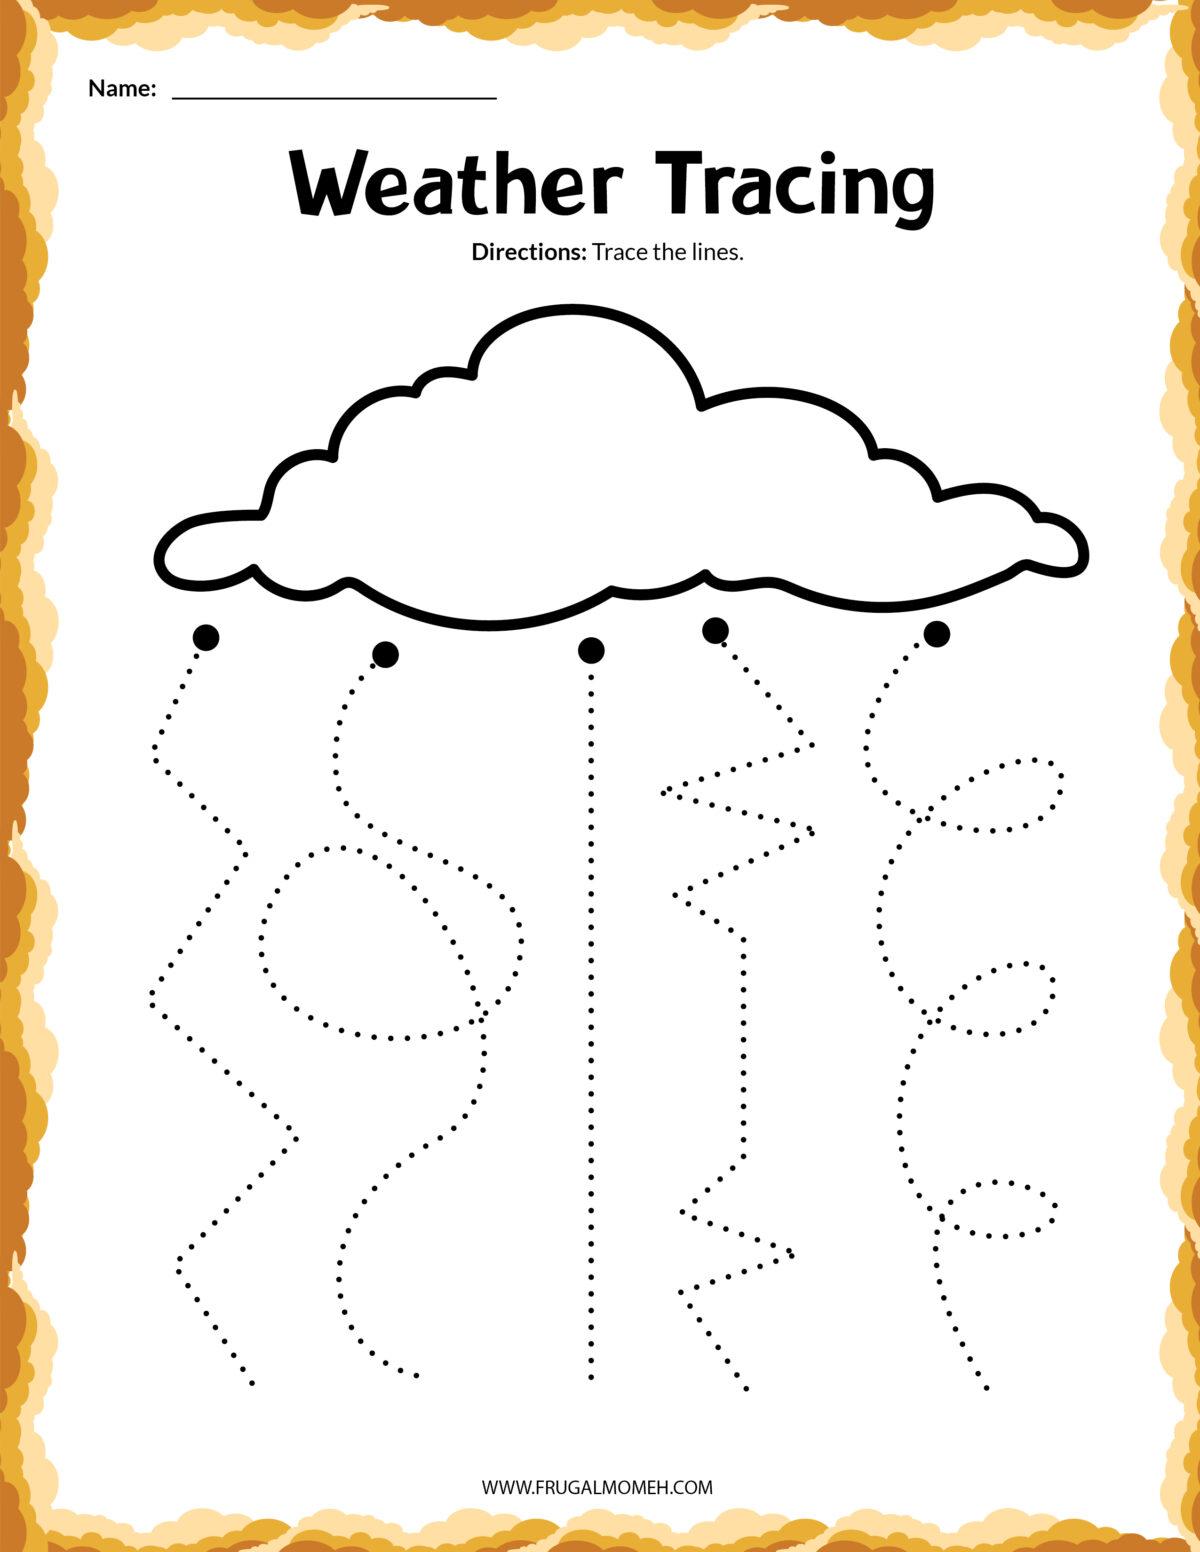 Weather tracing printable sheet.